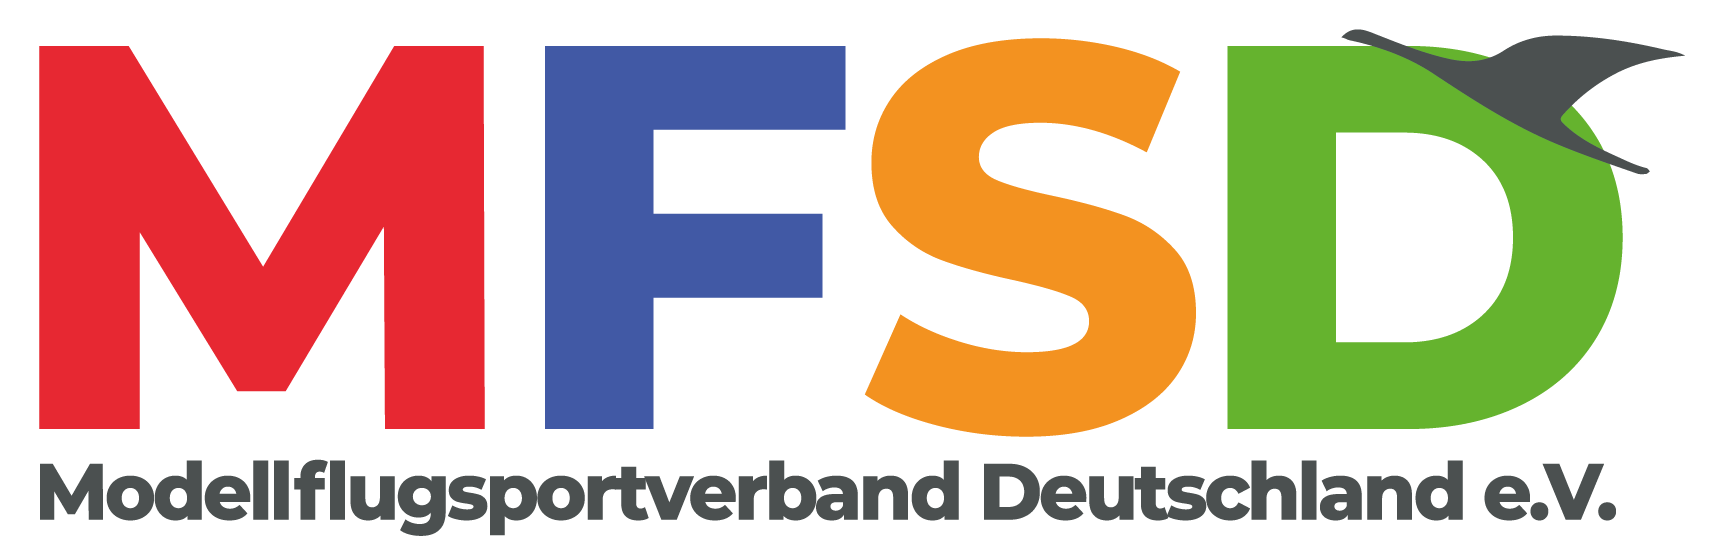 Modellflugsportverband Deutschland e.V.